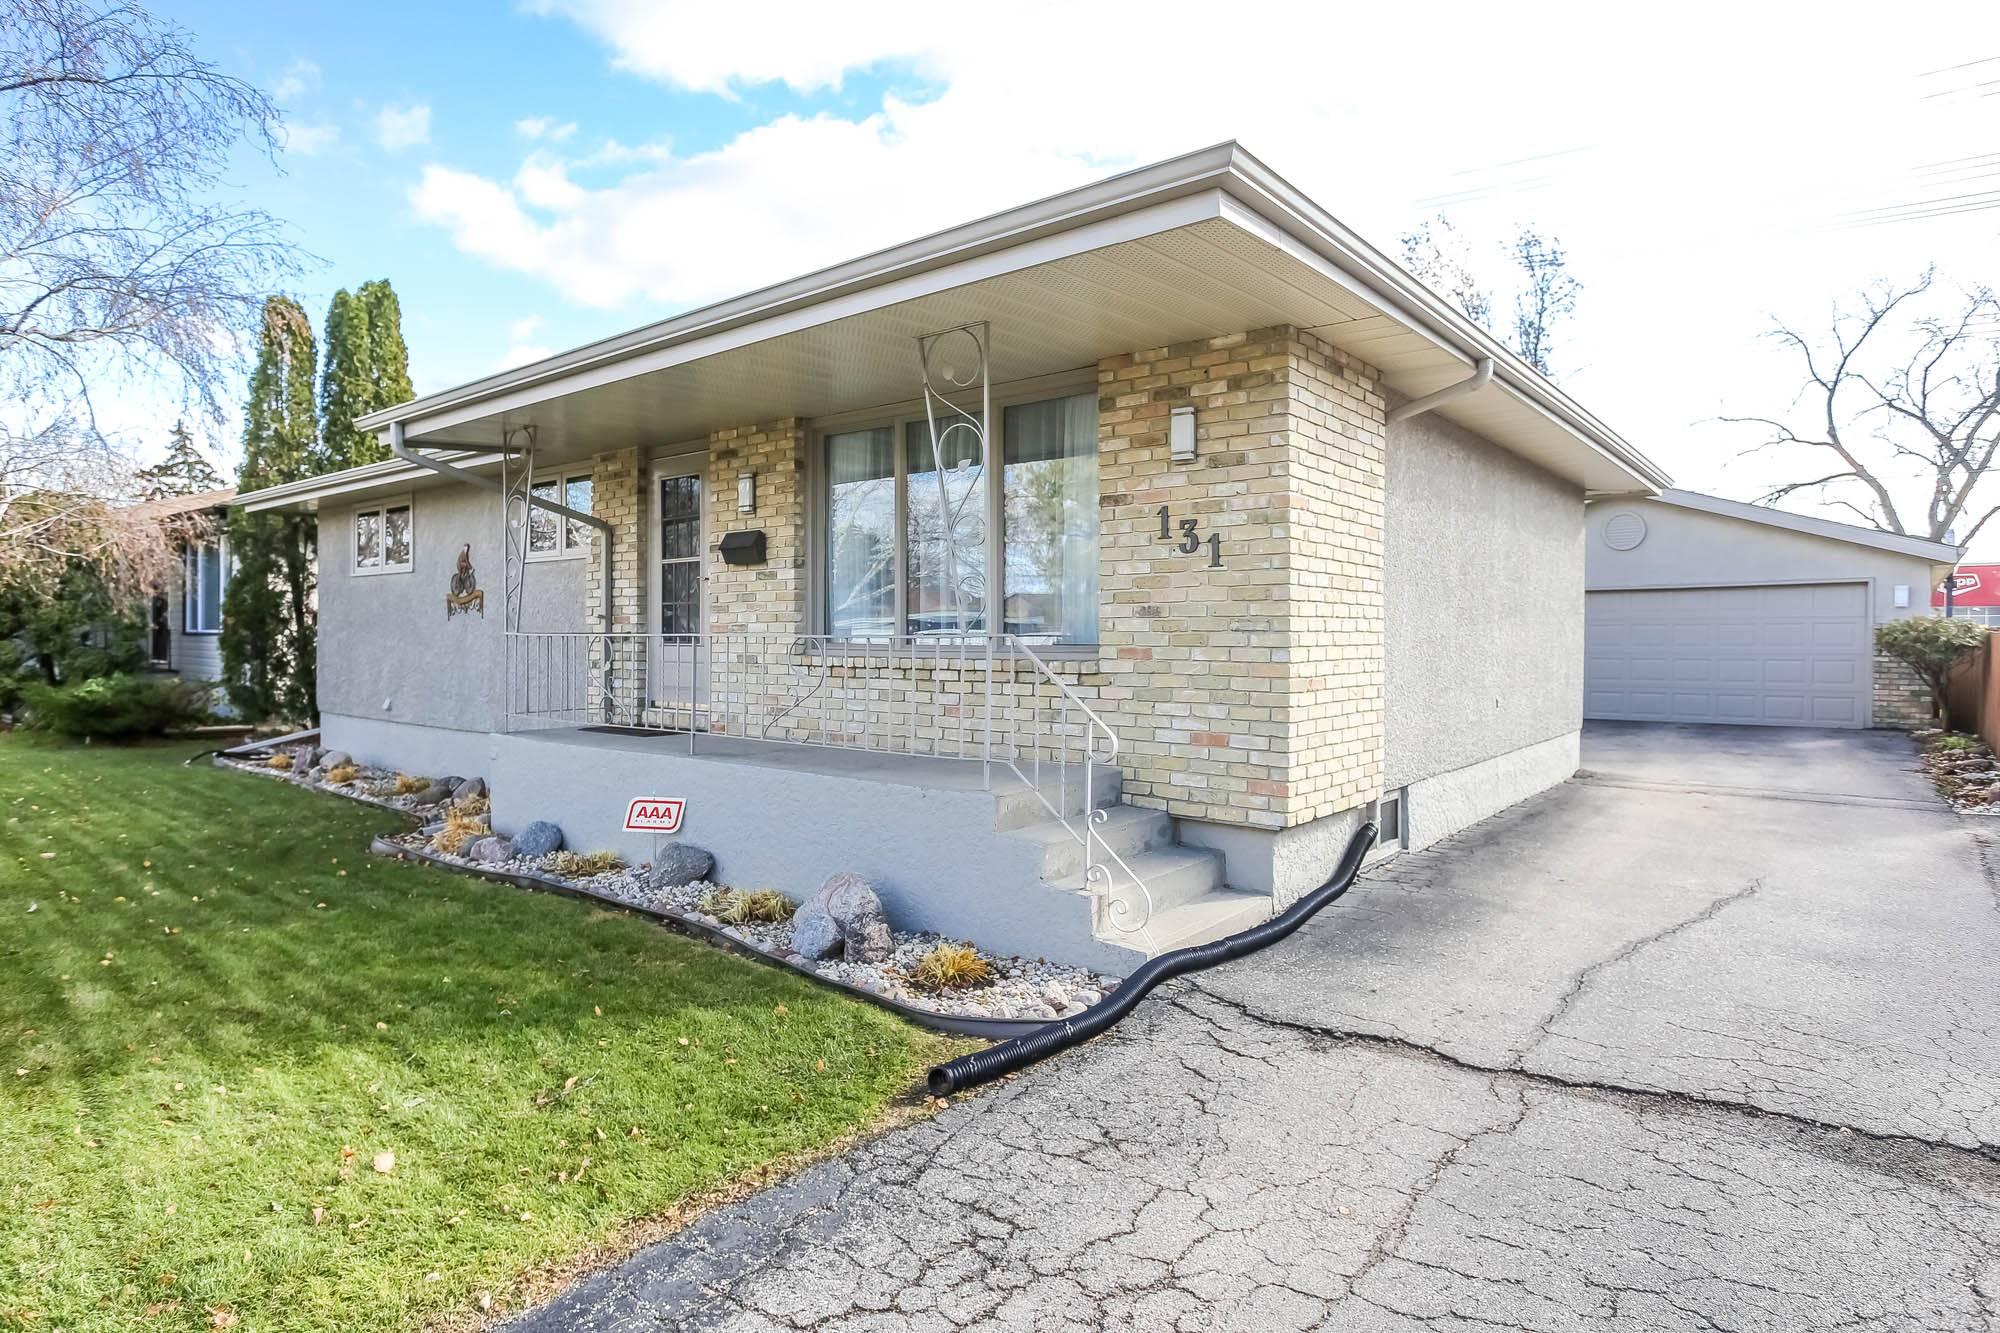 131 Crestwood, Winnipeg, Manitoba  R2J 1H8 - Photo 35 - 1929711